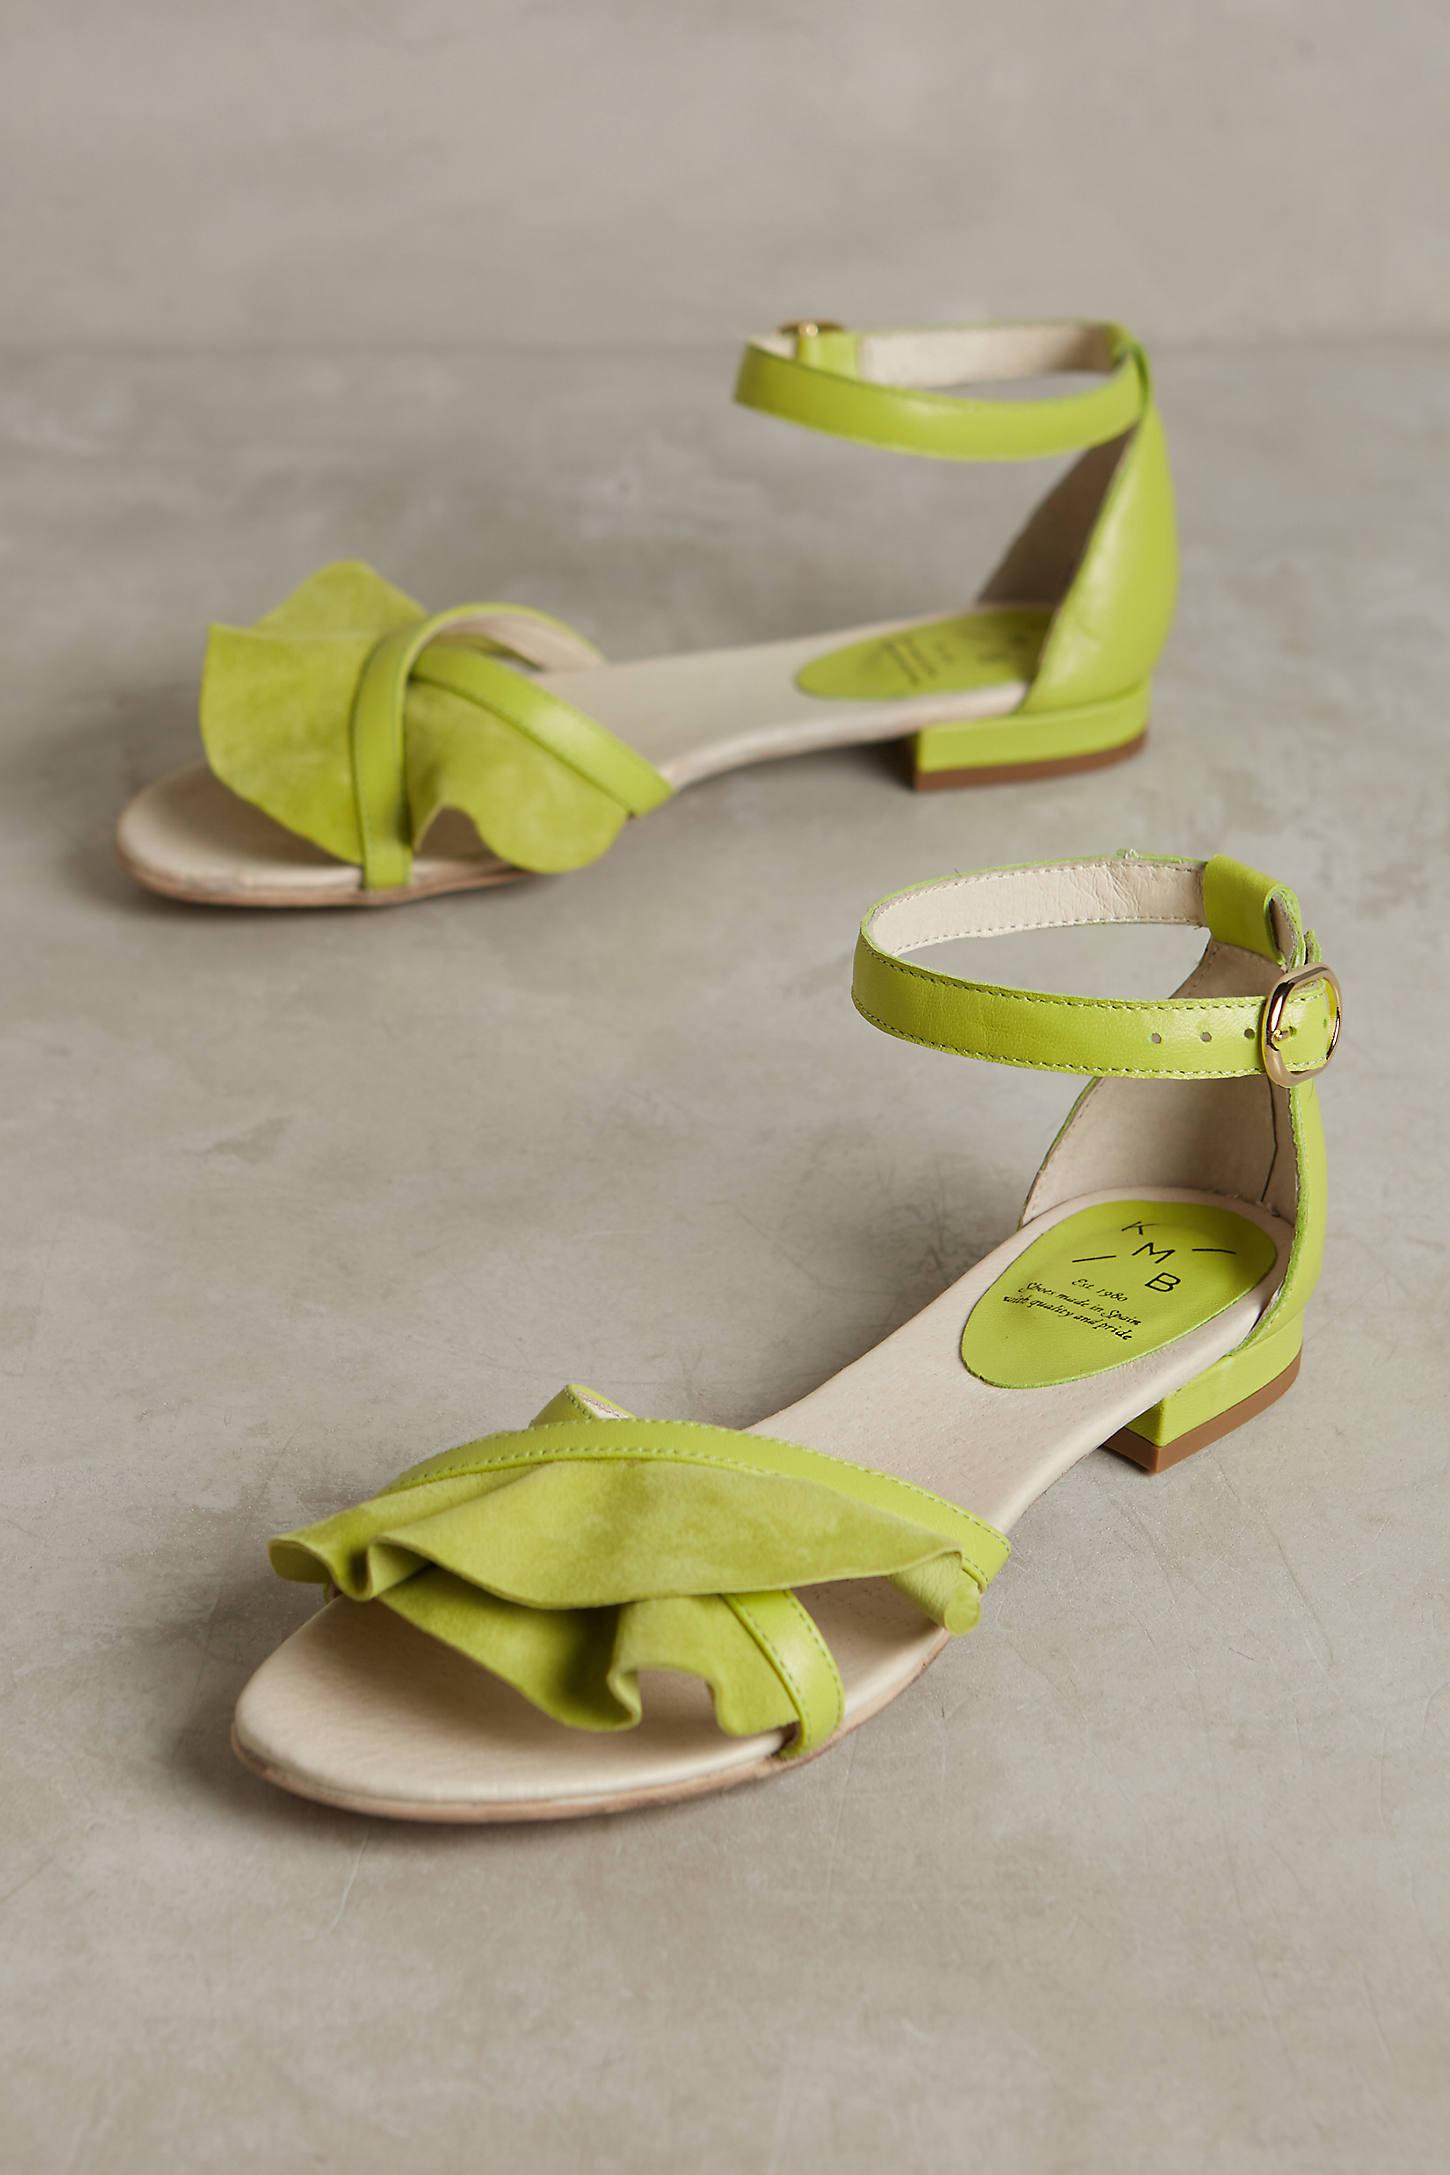 KMB Ruffled Cross-Strap Sandals